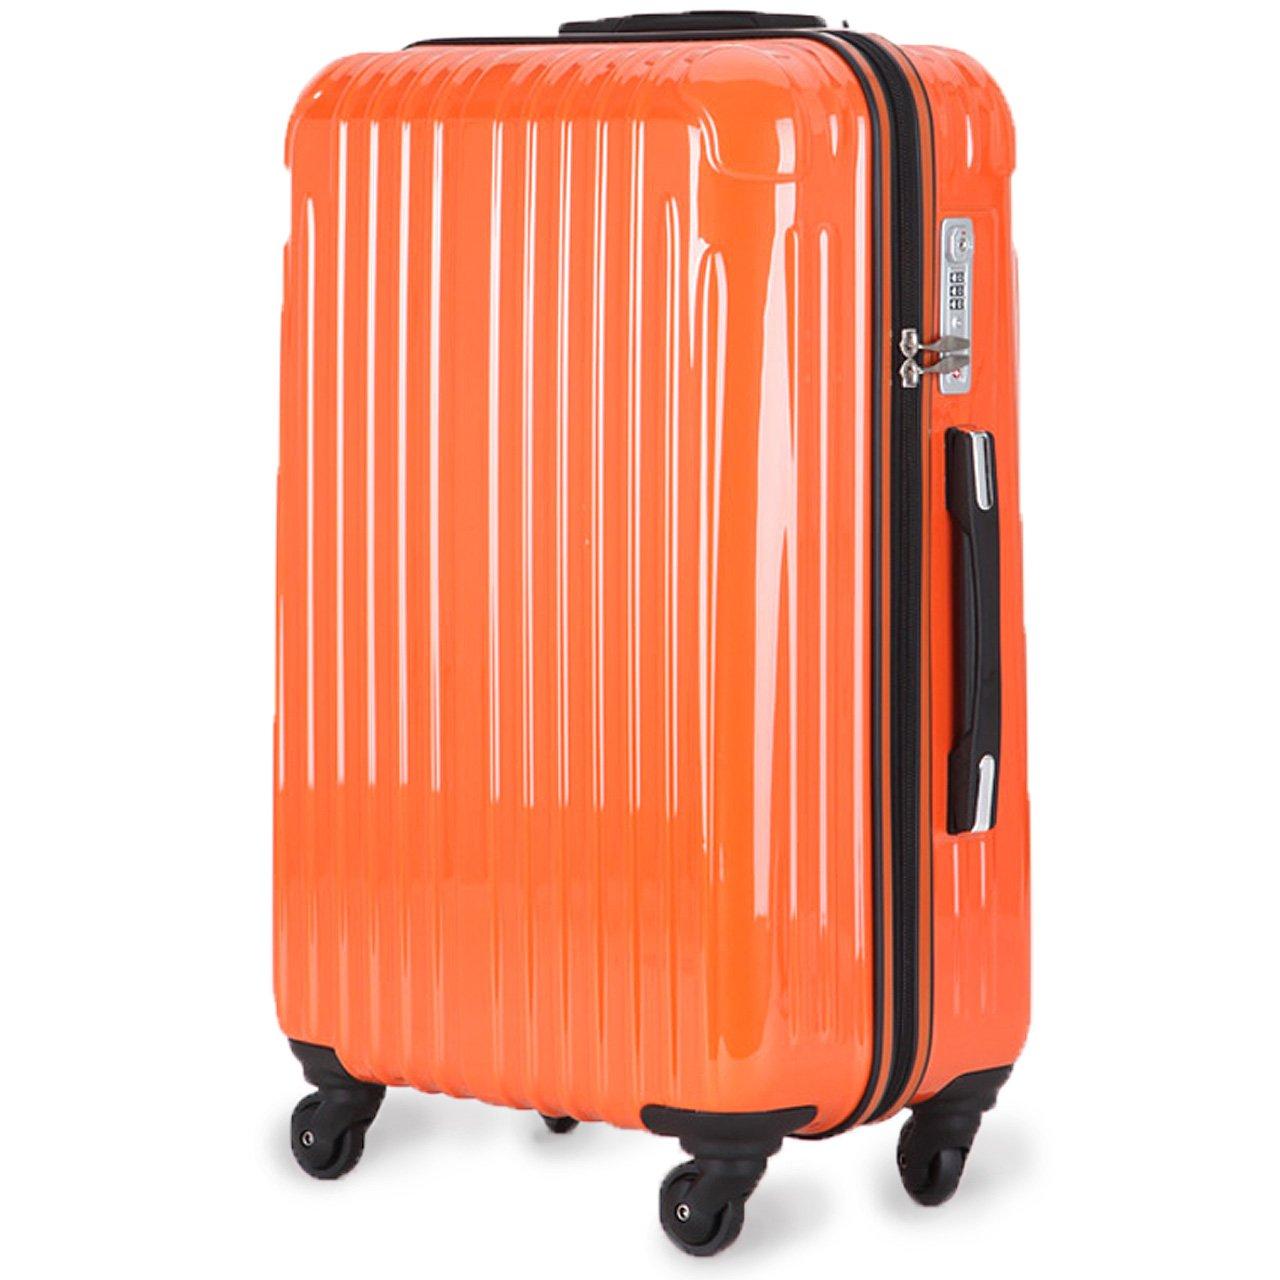 strike[ストライク]超軽量 2年保証 スーツケース TSAロック搭載 旅行バック トランクケース 旅行カバン B075CJRBZH 中型アウトレット|オレンジ オレンジ 中型アウトレット